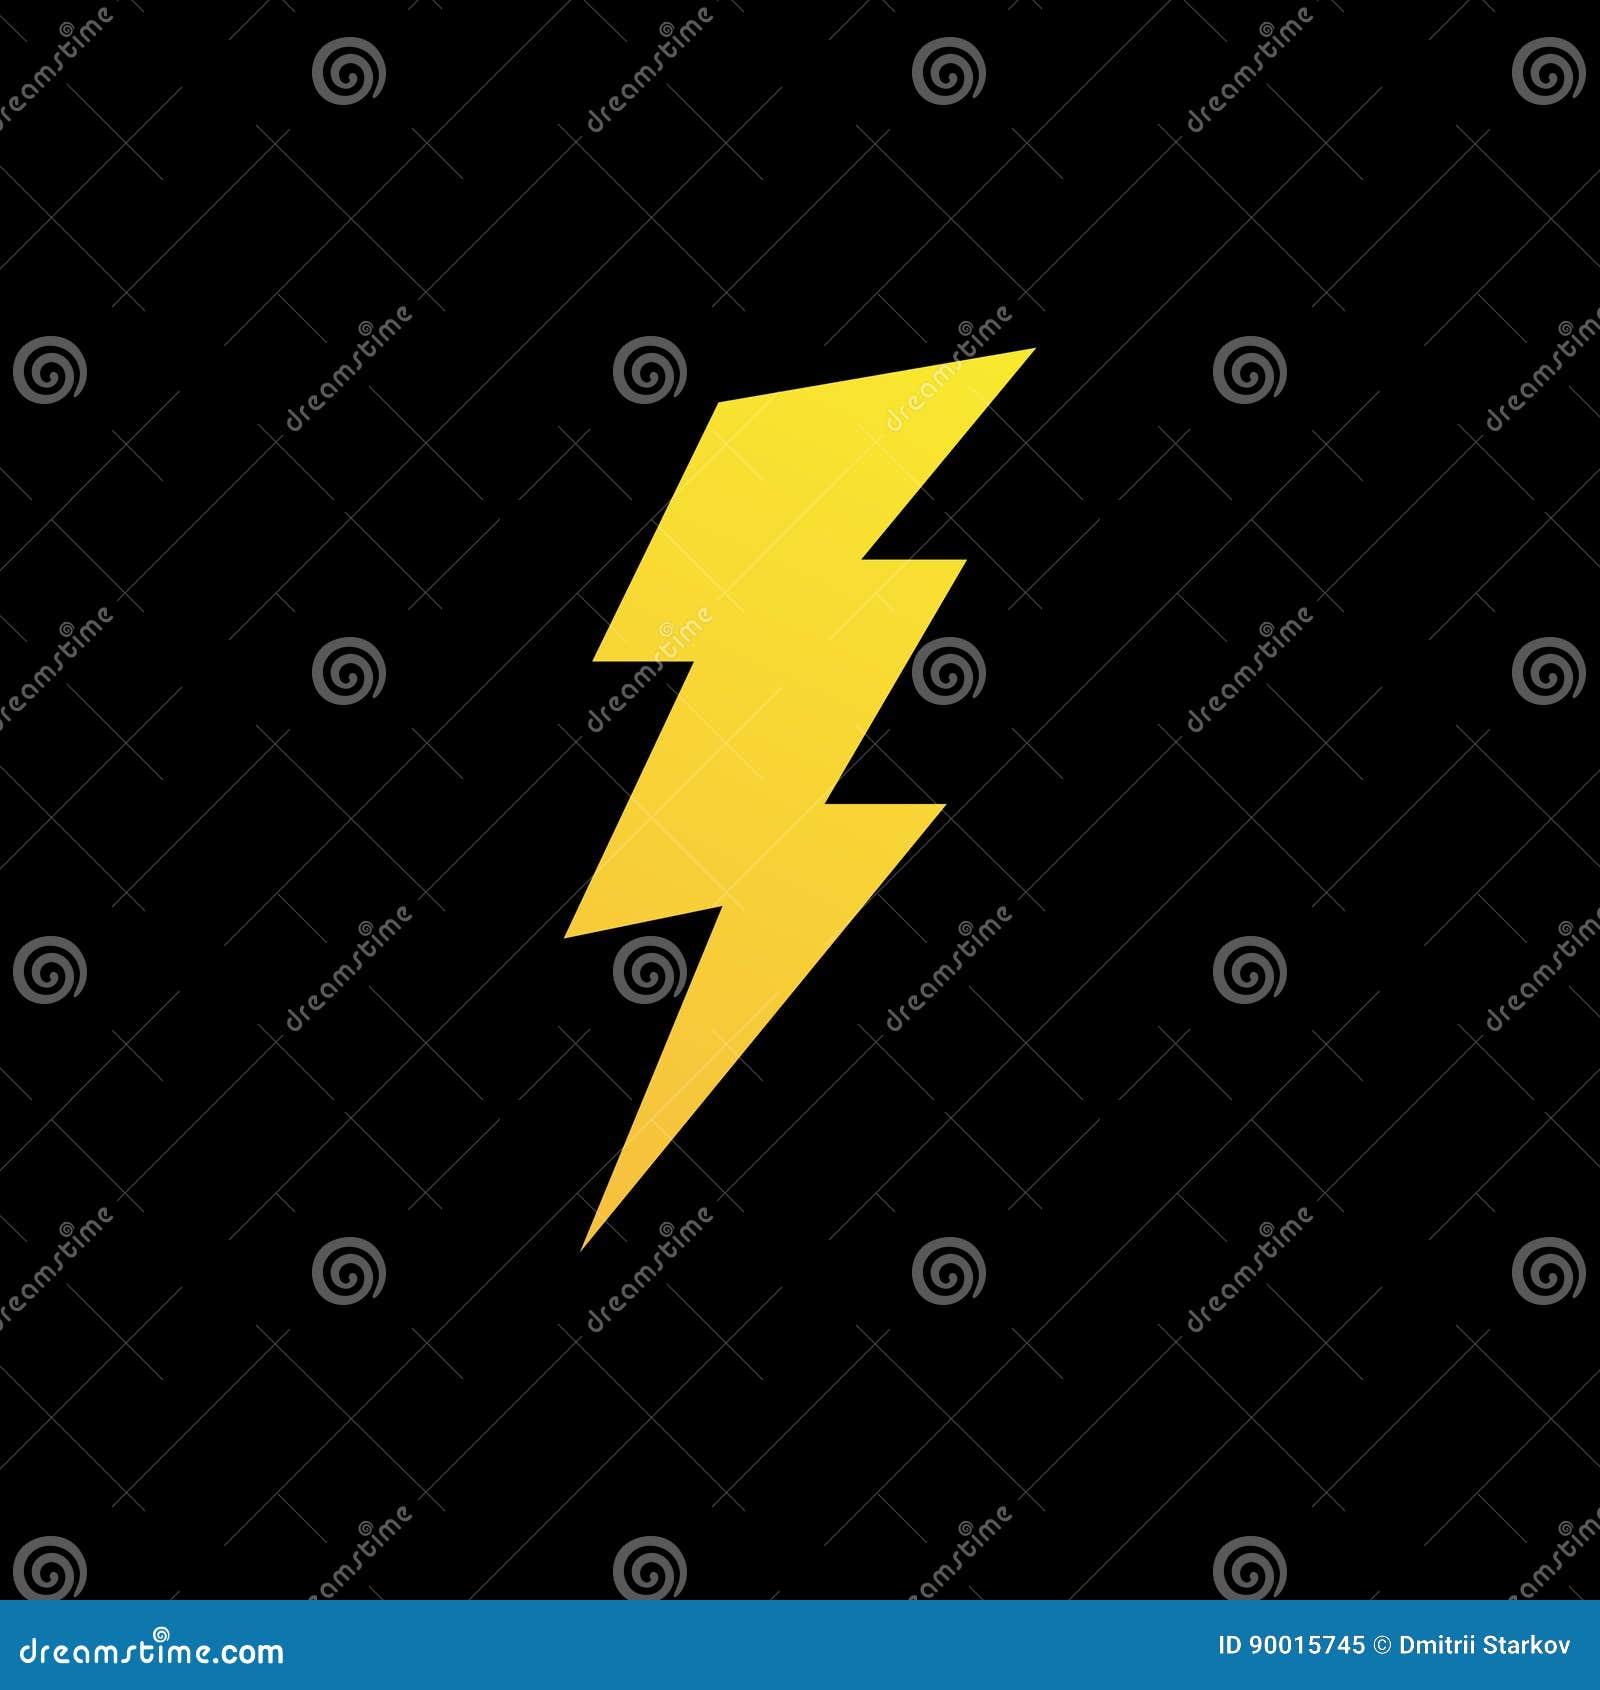 Lightning Bolt Icon Or Logo In Modern Flat Style. Stock Vector ...